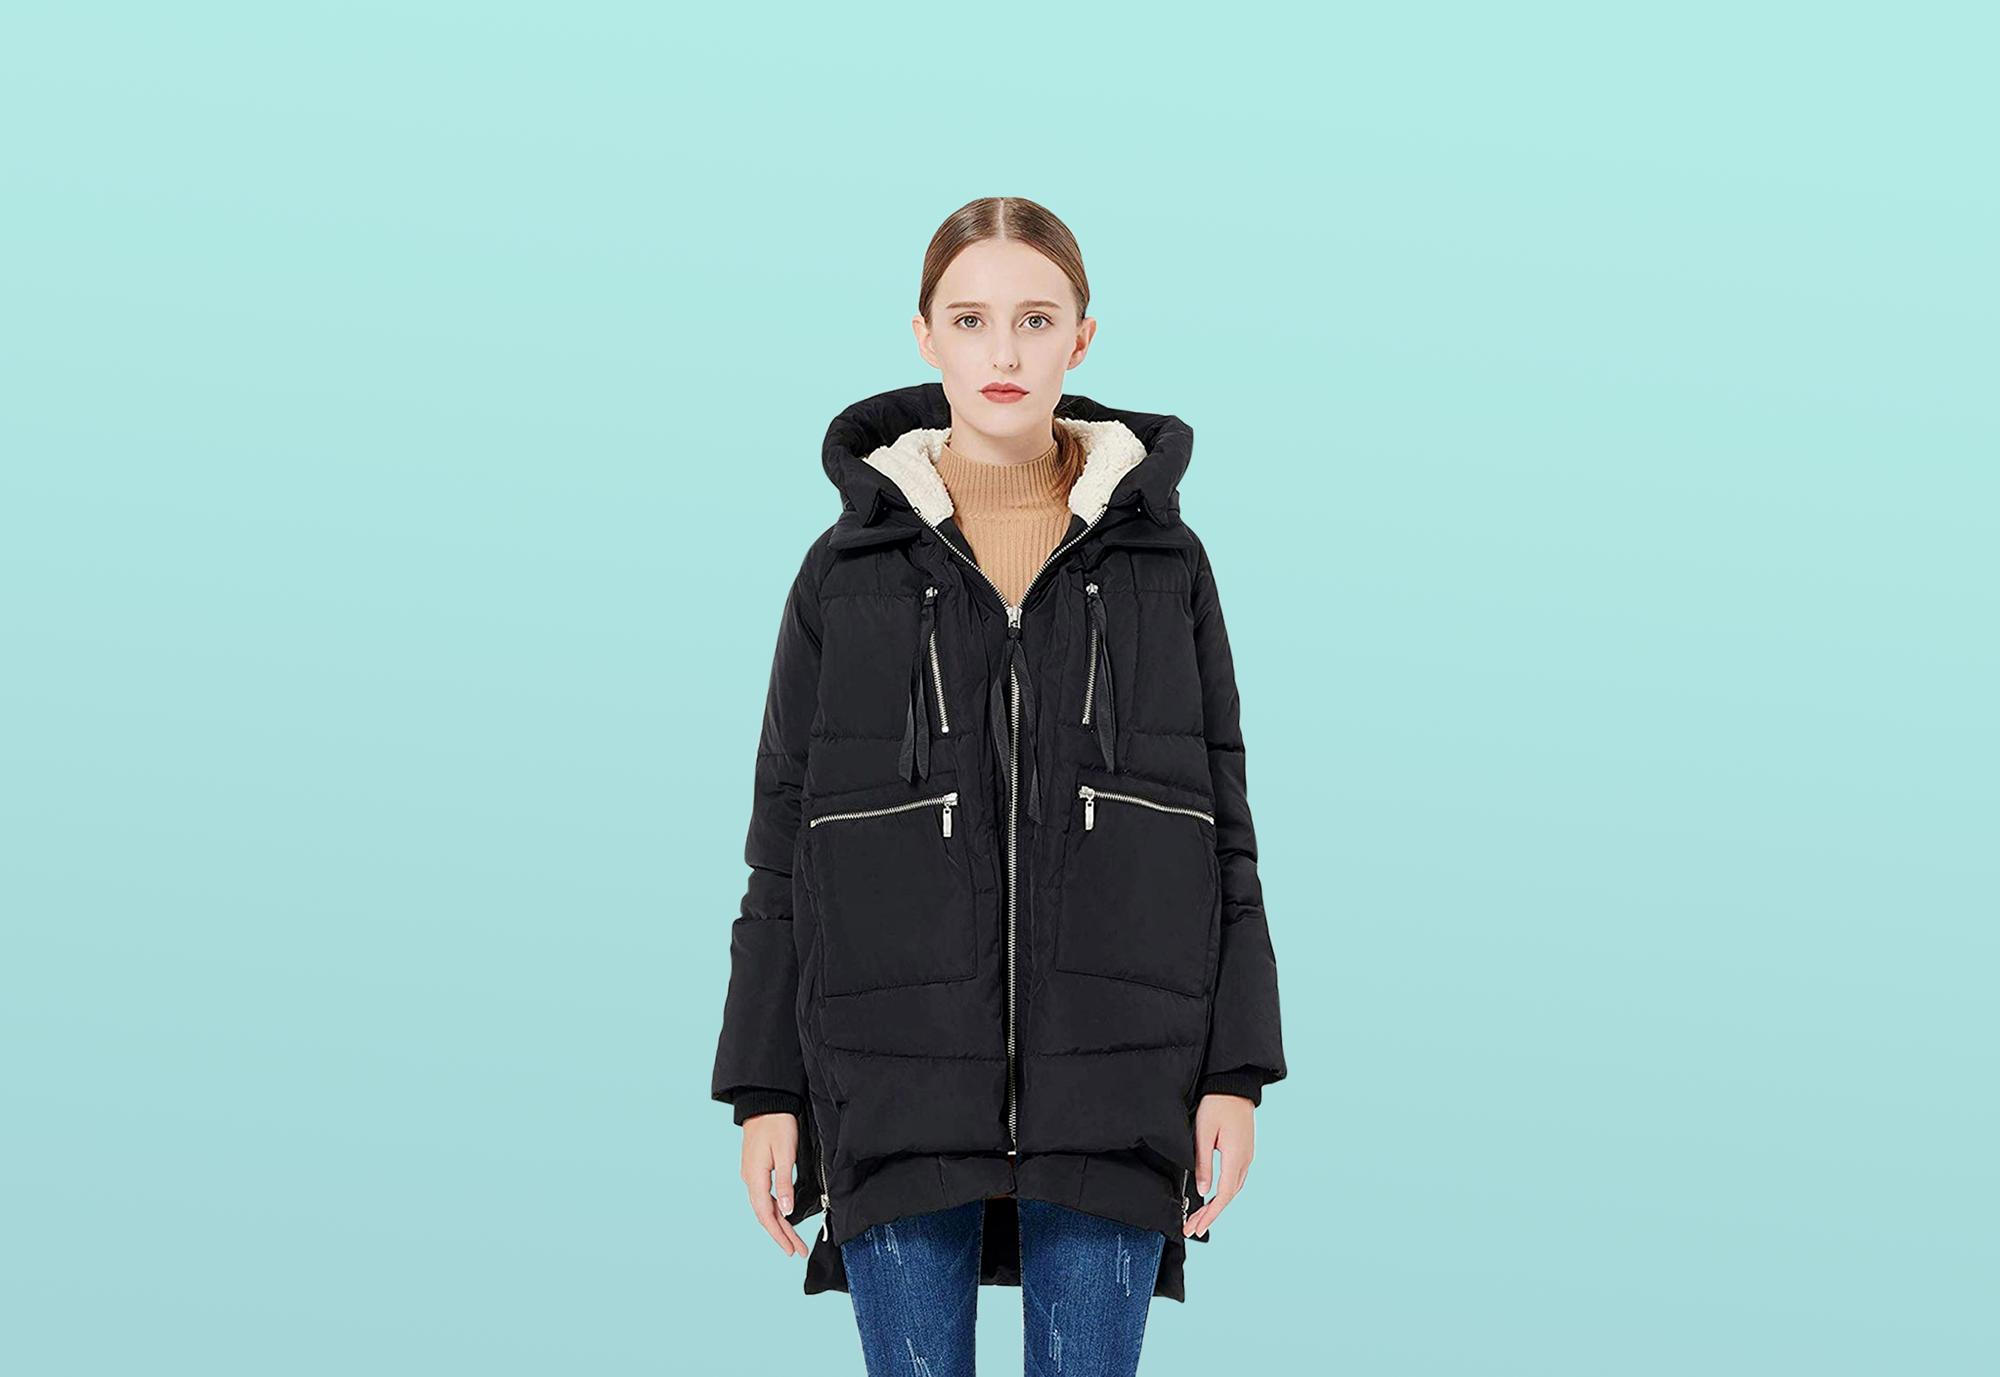 antarctic clothing